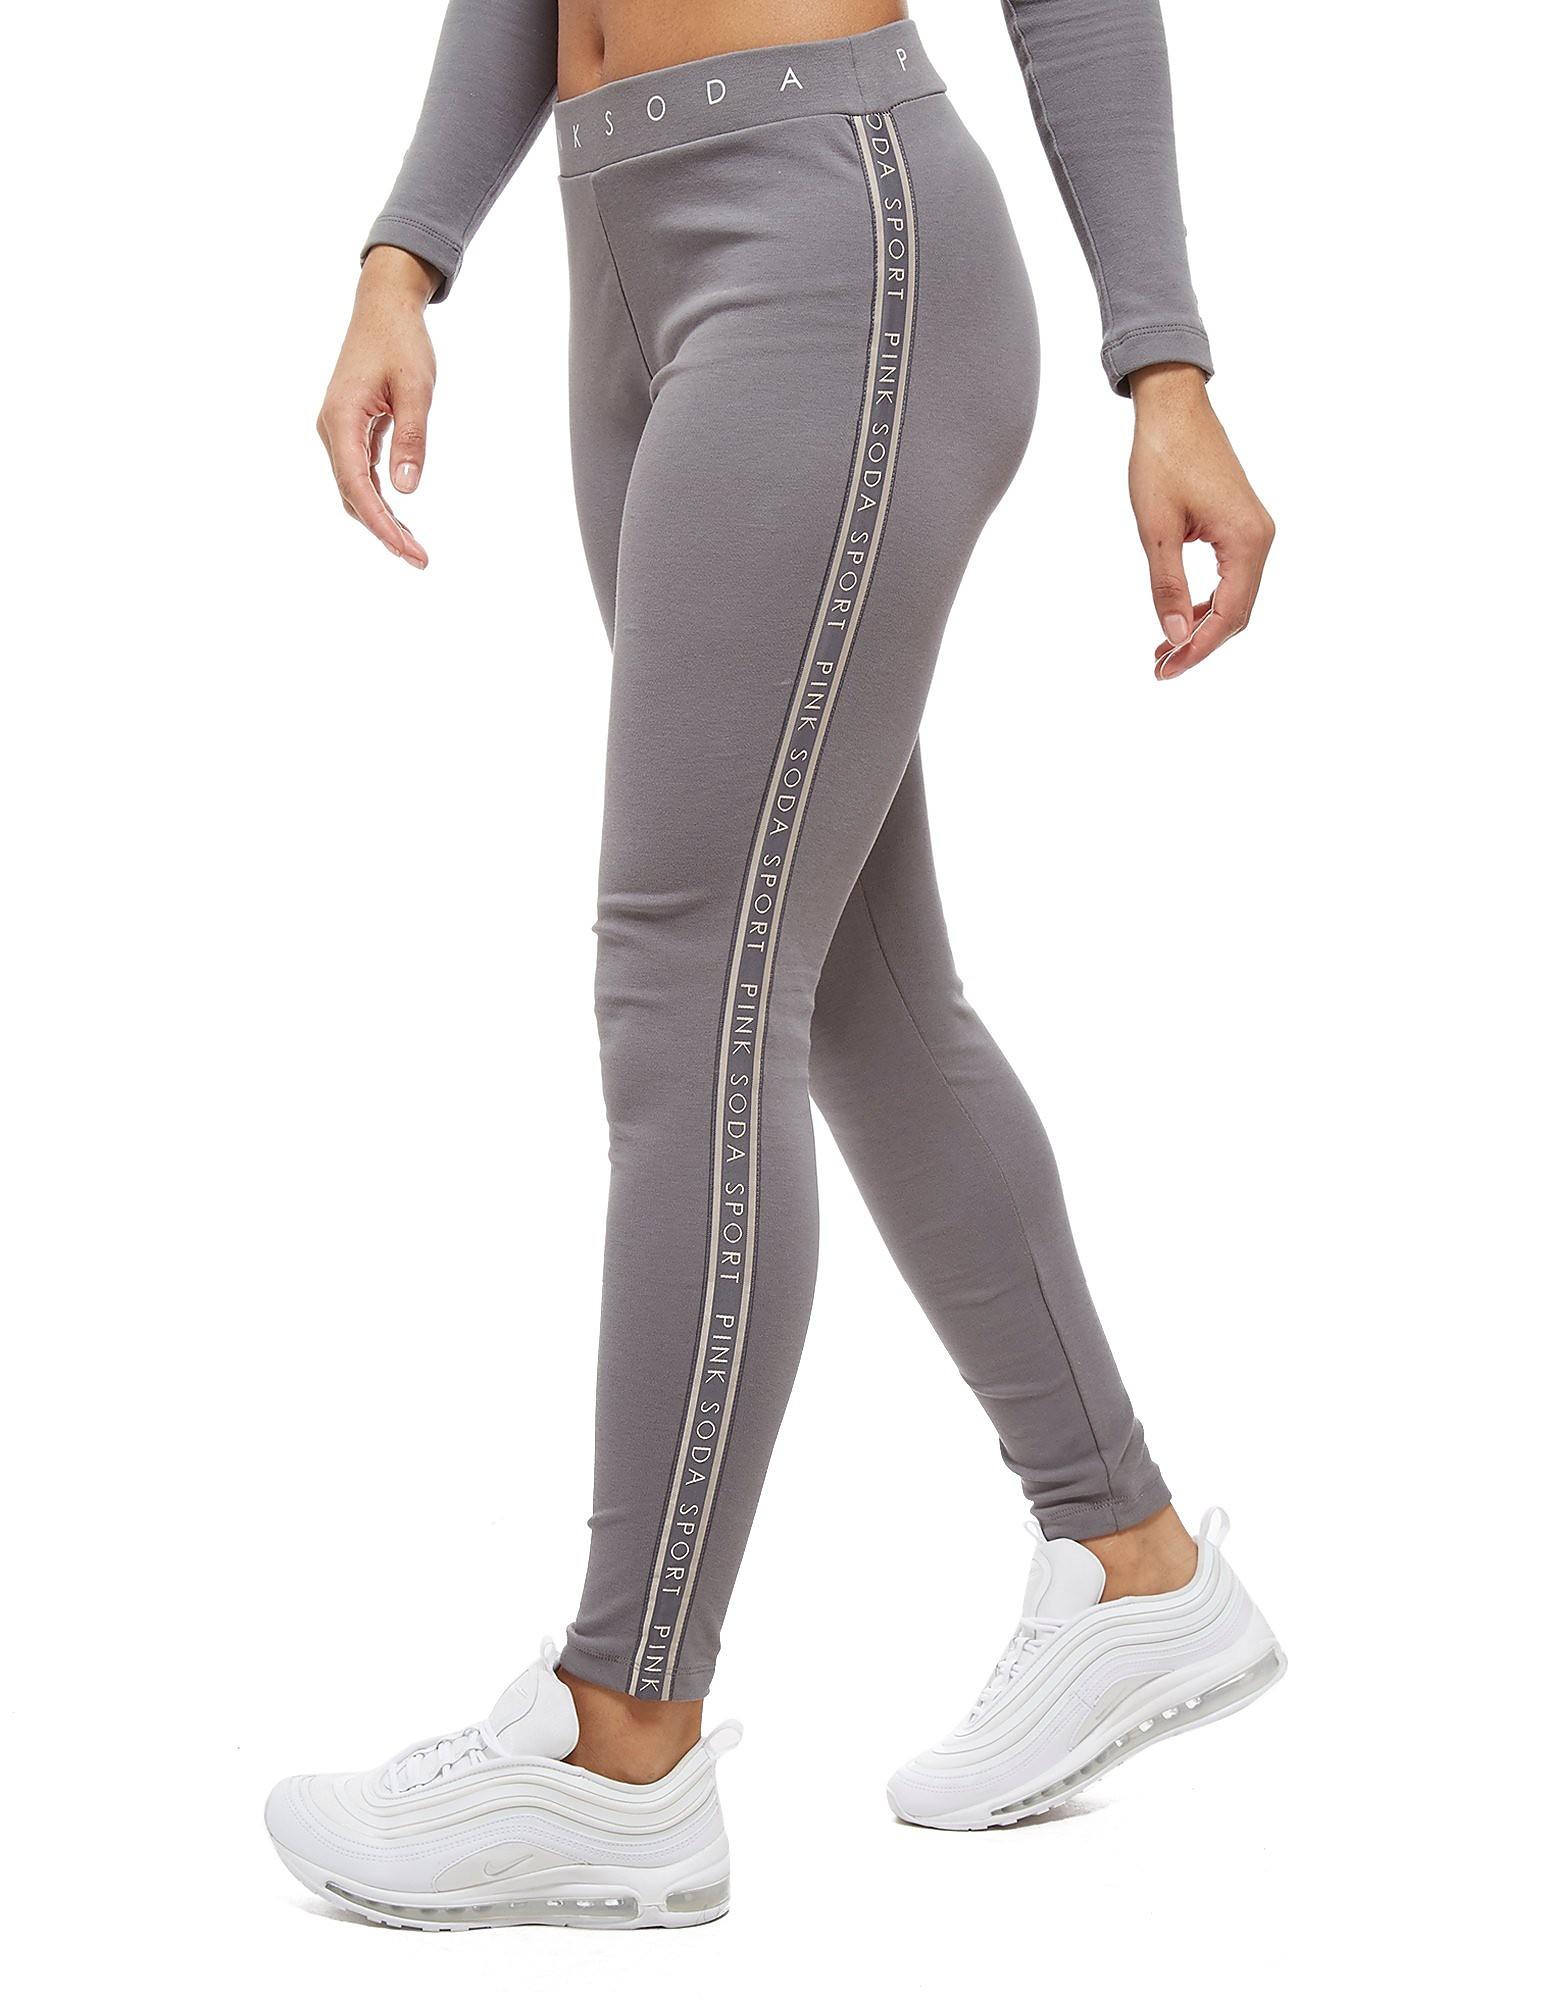 Pink Soda Sport Tape Lifestyle Leggings